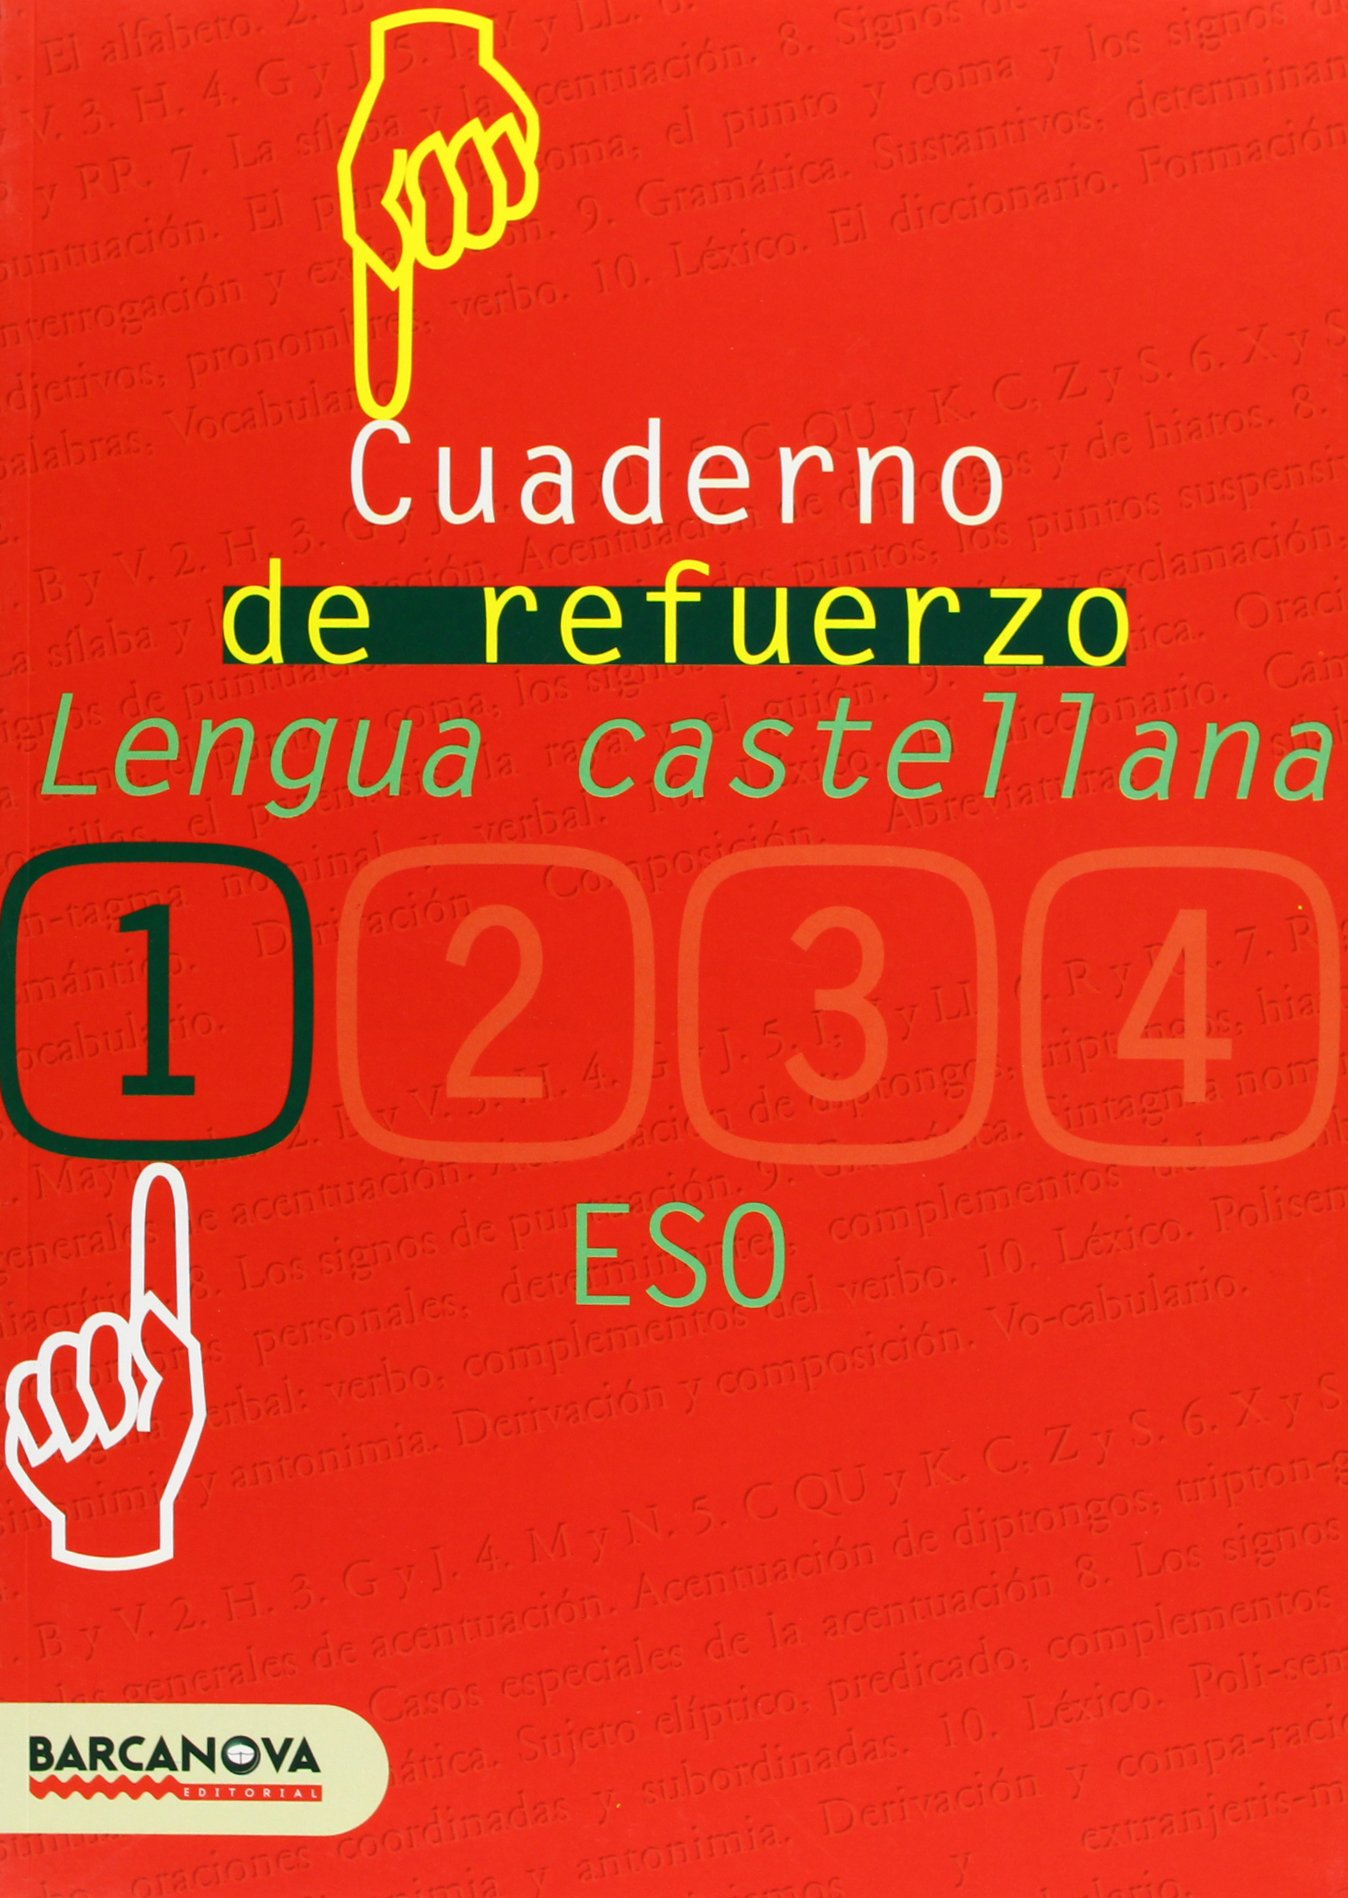 Cuaderno de refuerzo de lengua castellana 1 Materials Educatius - Eso - Lengua Castellana - 9788448917227: Amazon.es: Francisca Ezquerra Lezcano: Libros